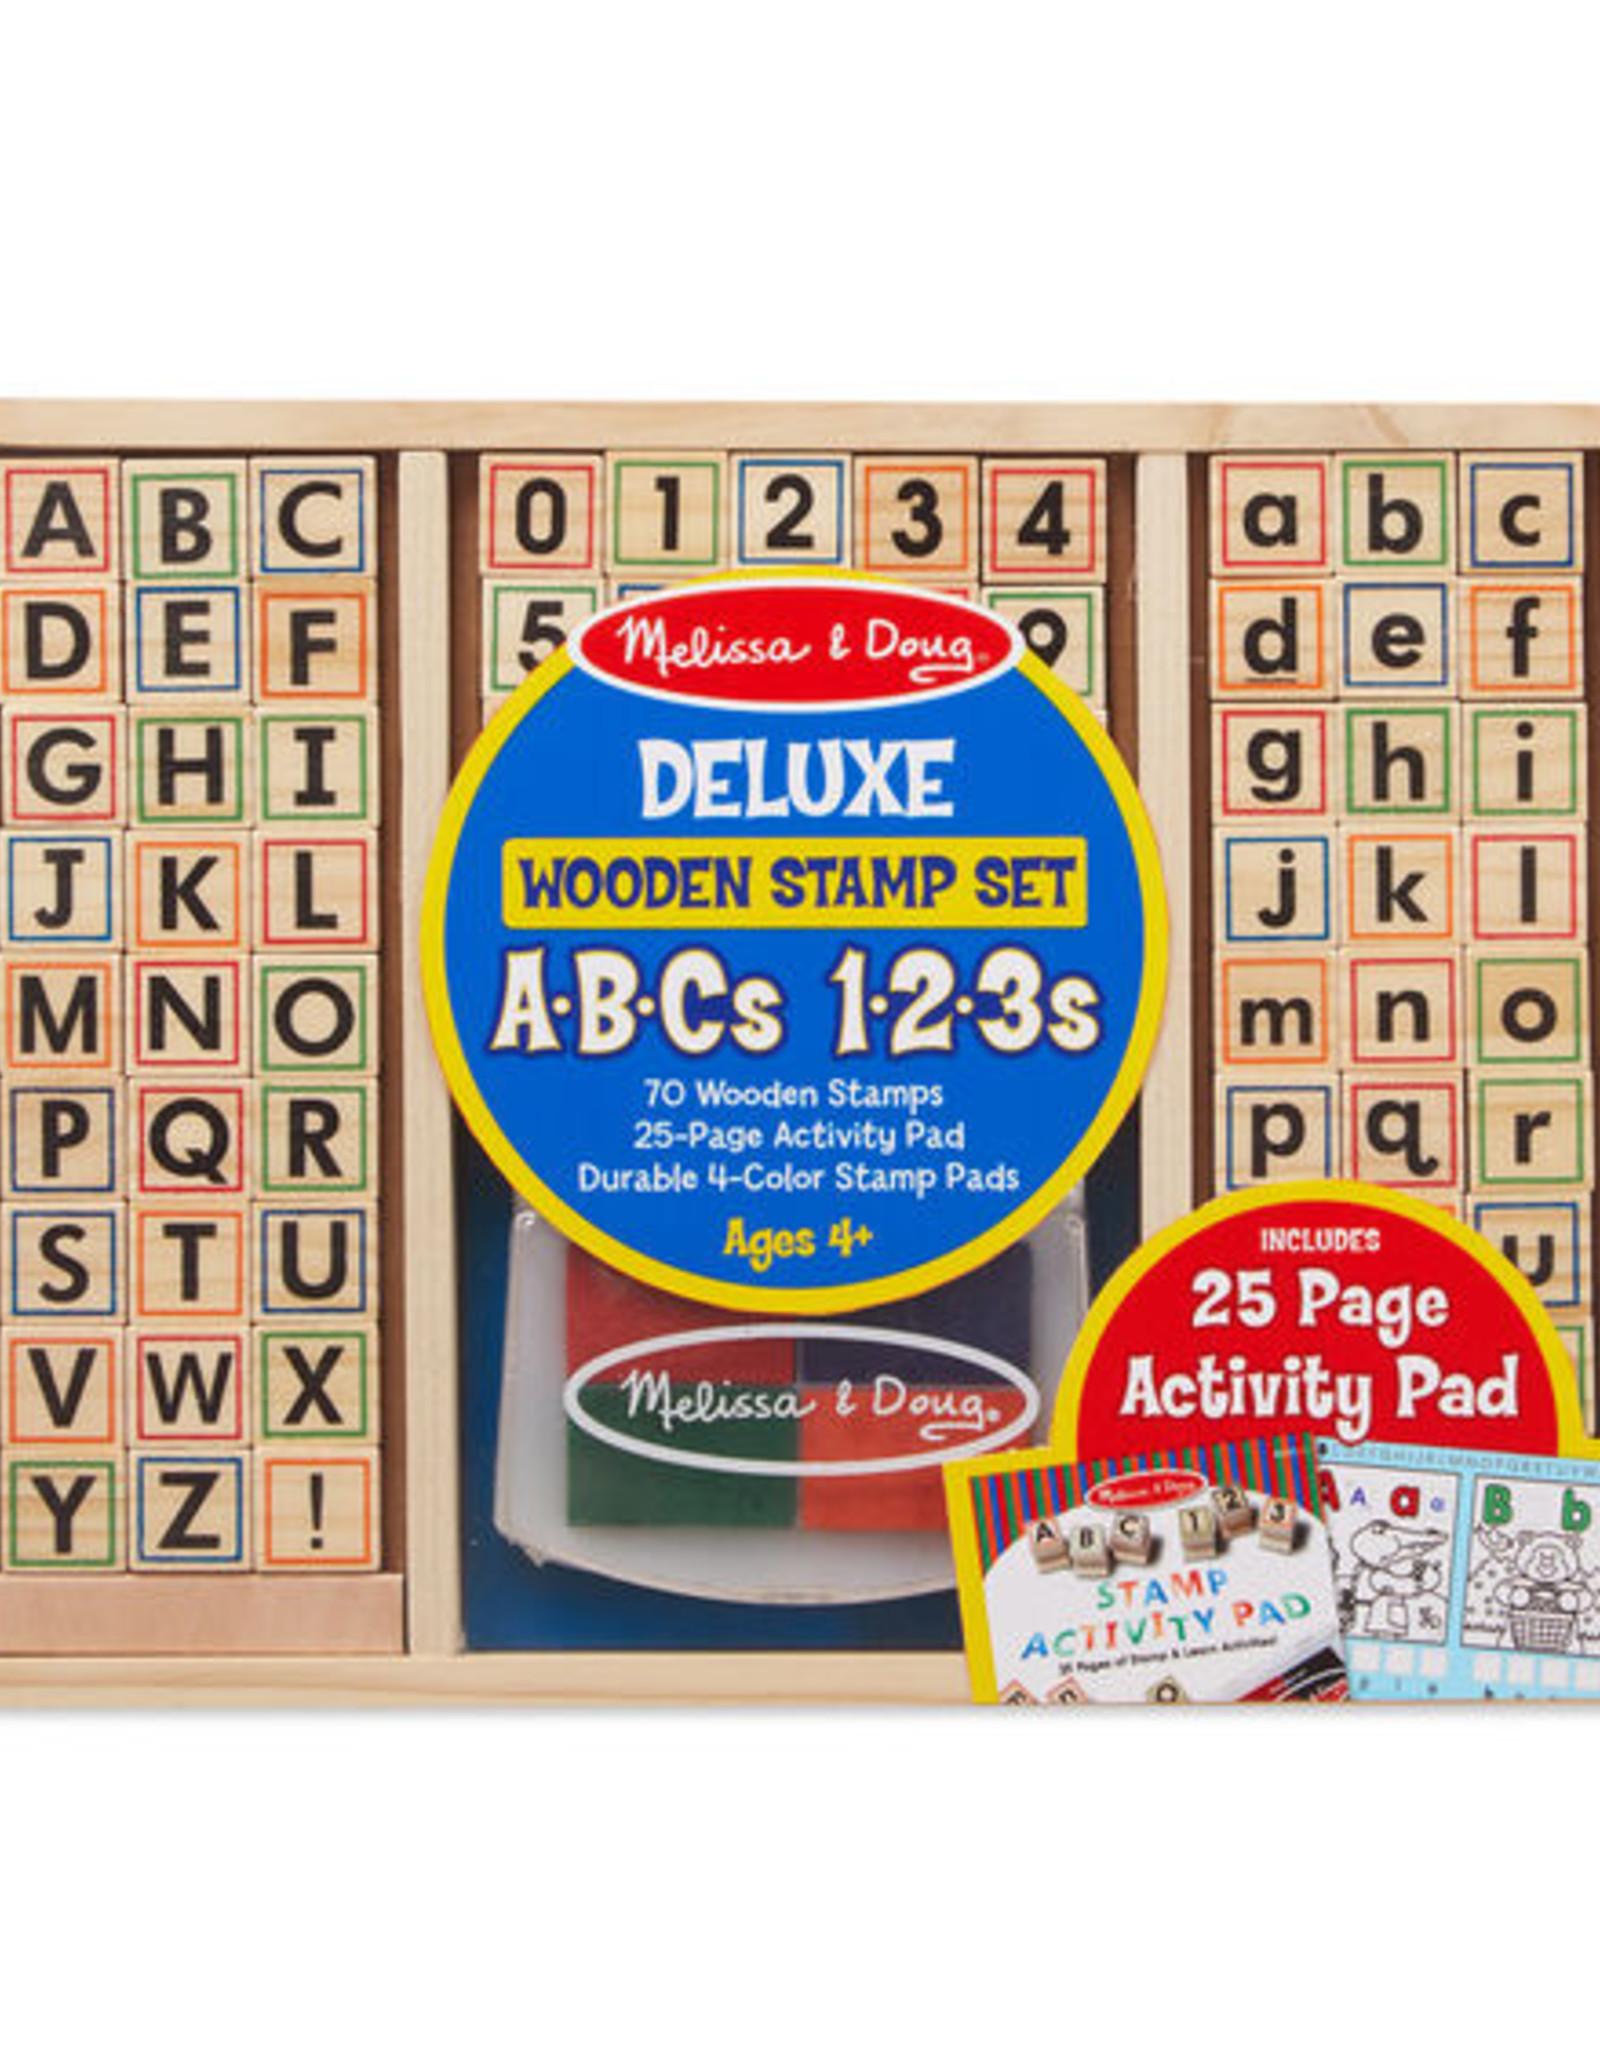 Melissa & Doug Deluxe Wooden Stamp Set - ABCs - 123s